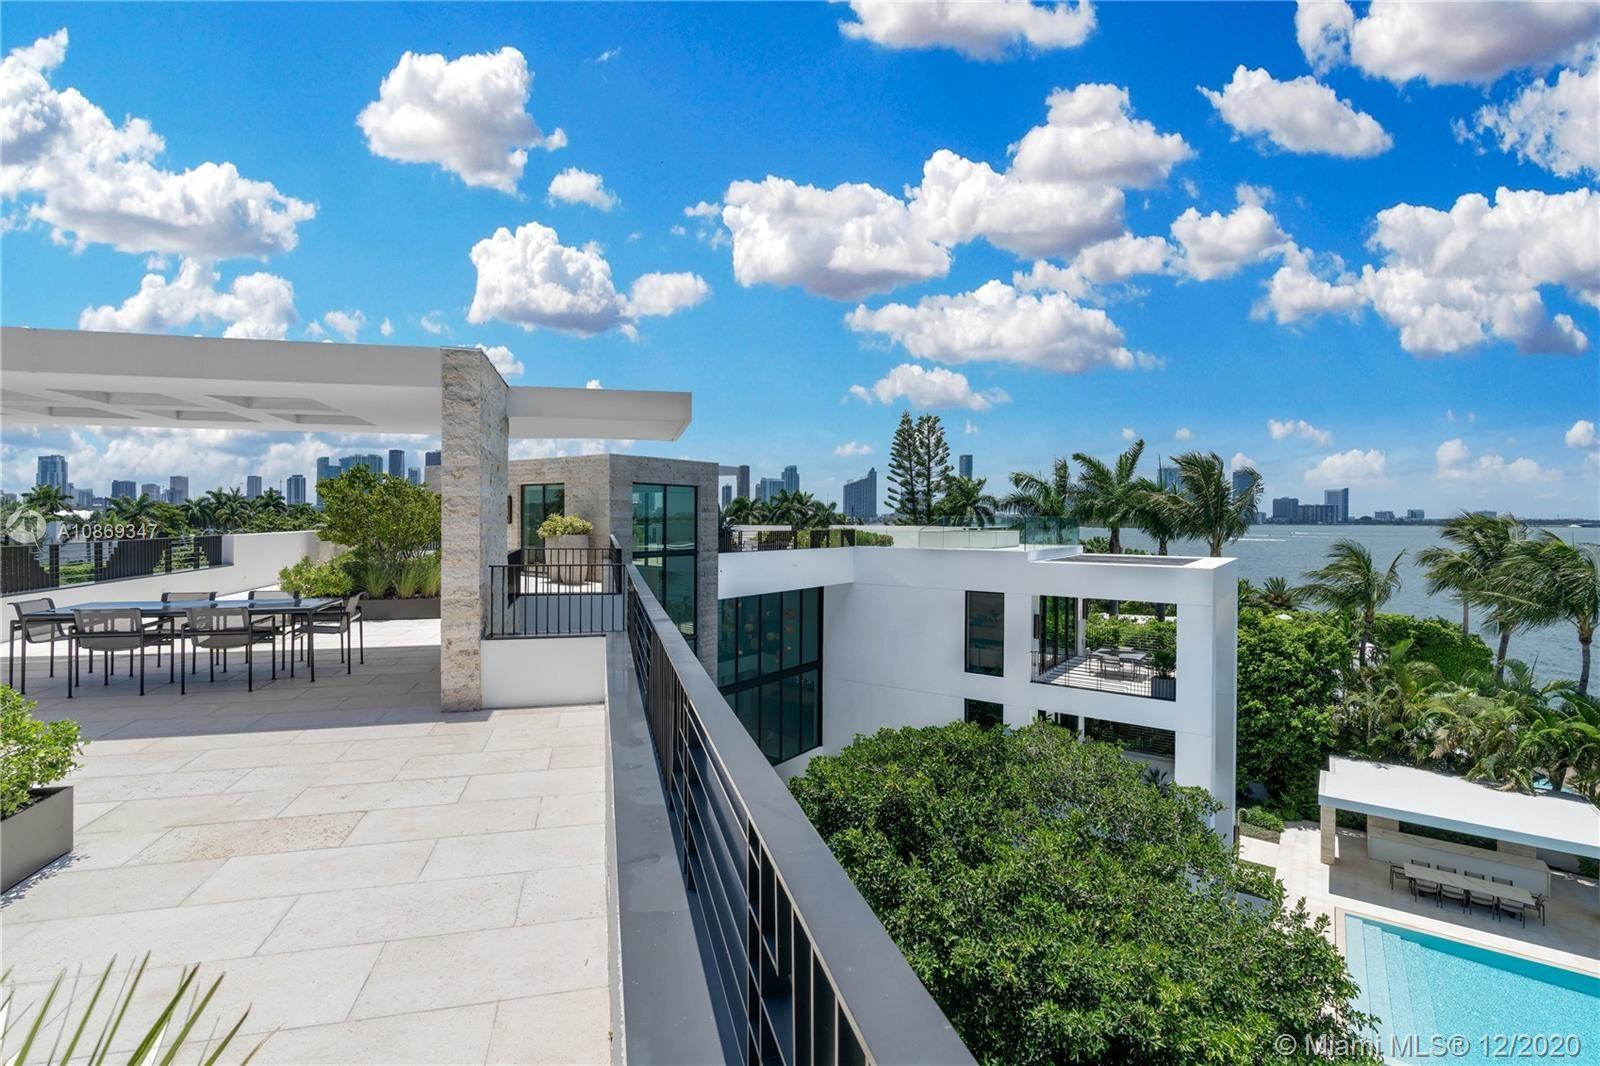 Photo 7 of Listing MLS a10869347 in 1429 N Venetian Way Miami FL 33139